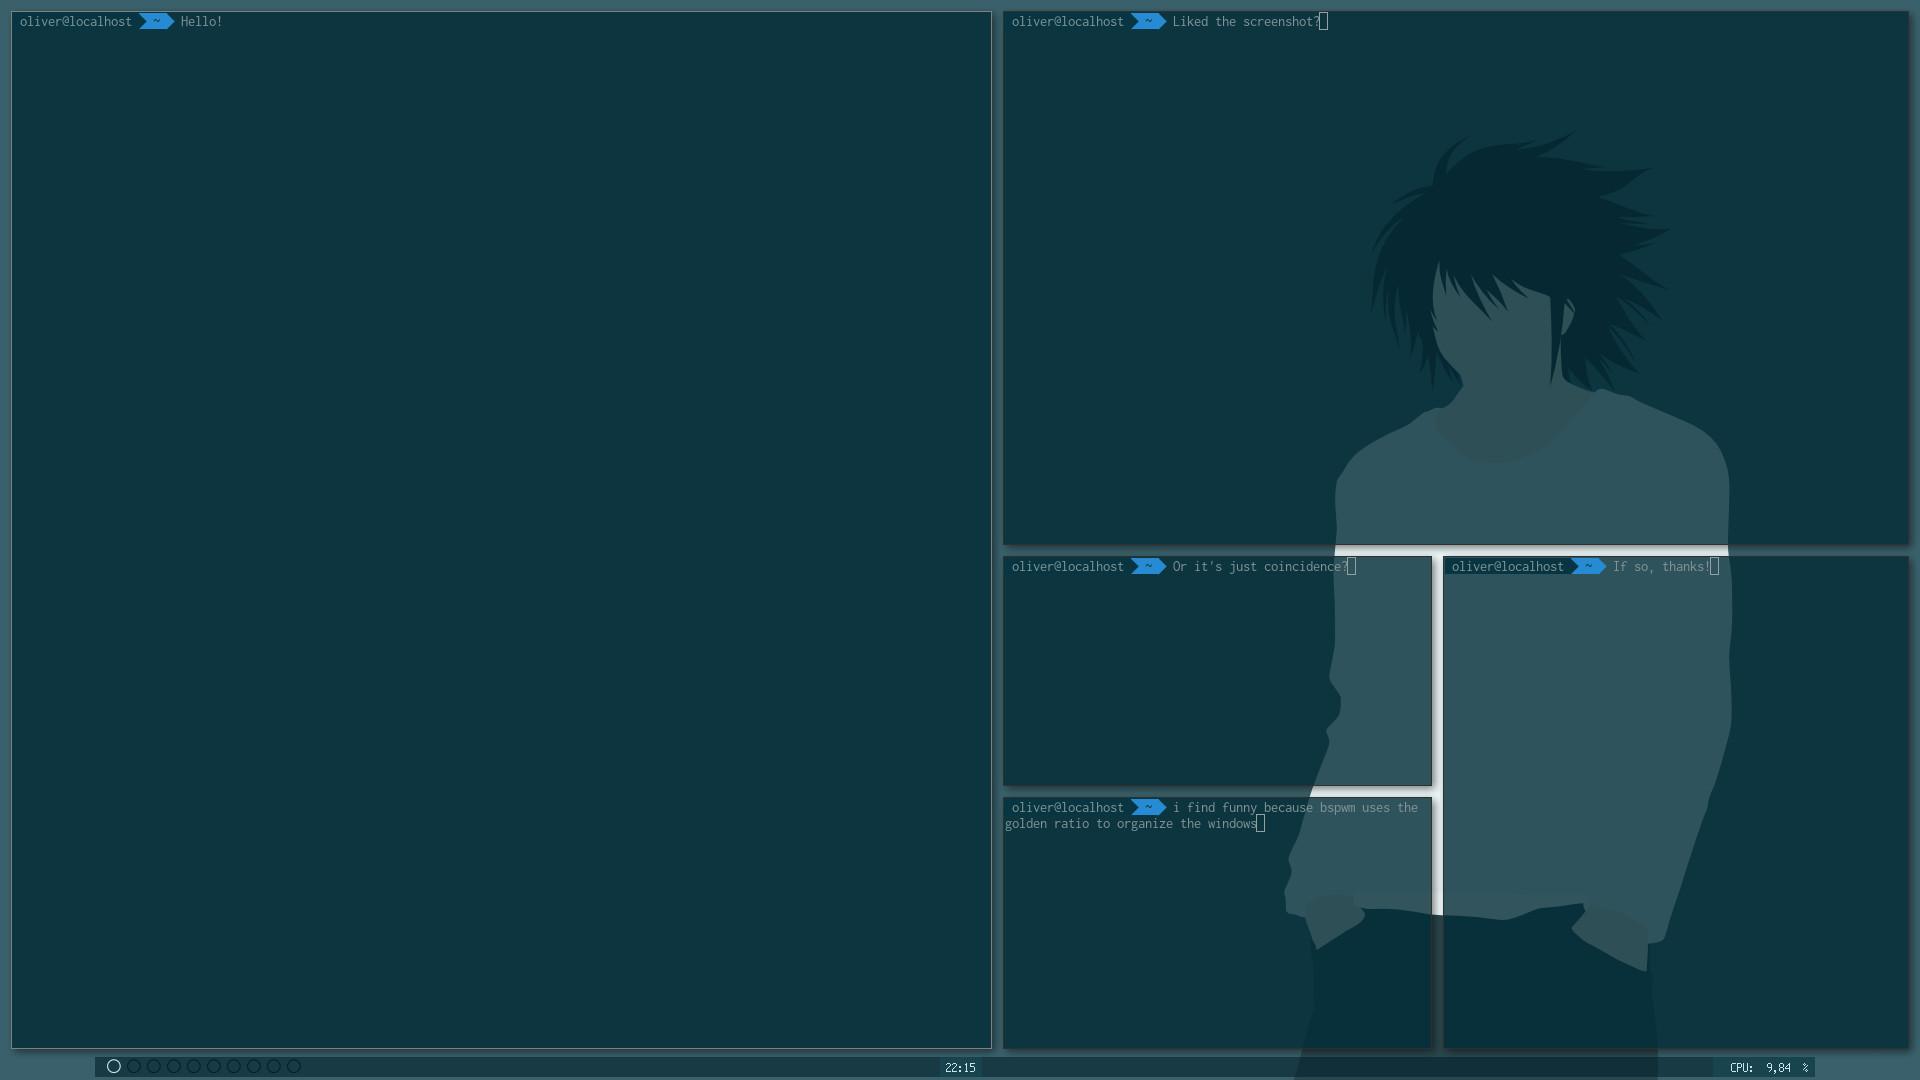 Wallpaper Arch Linux Desktop HD | Linux Wallpapers | Pinterest | Linux